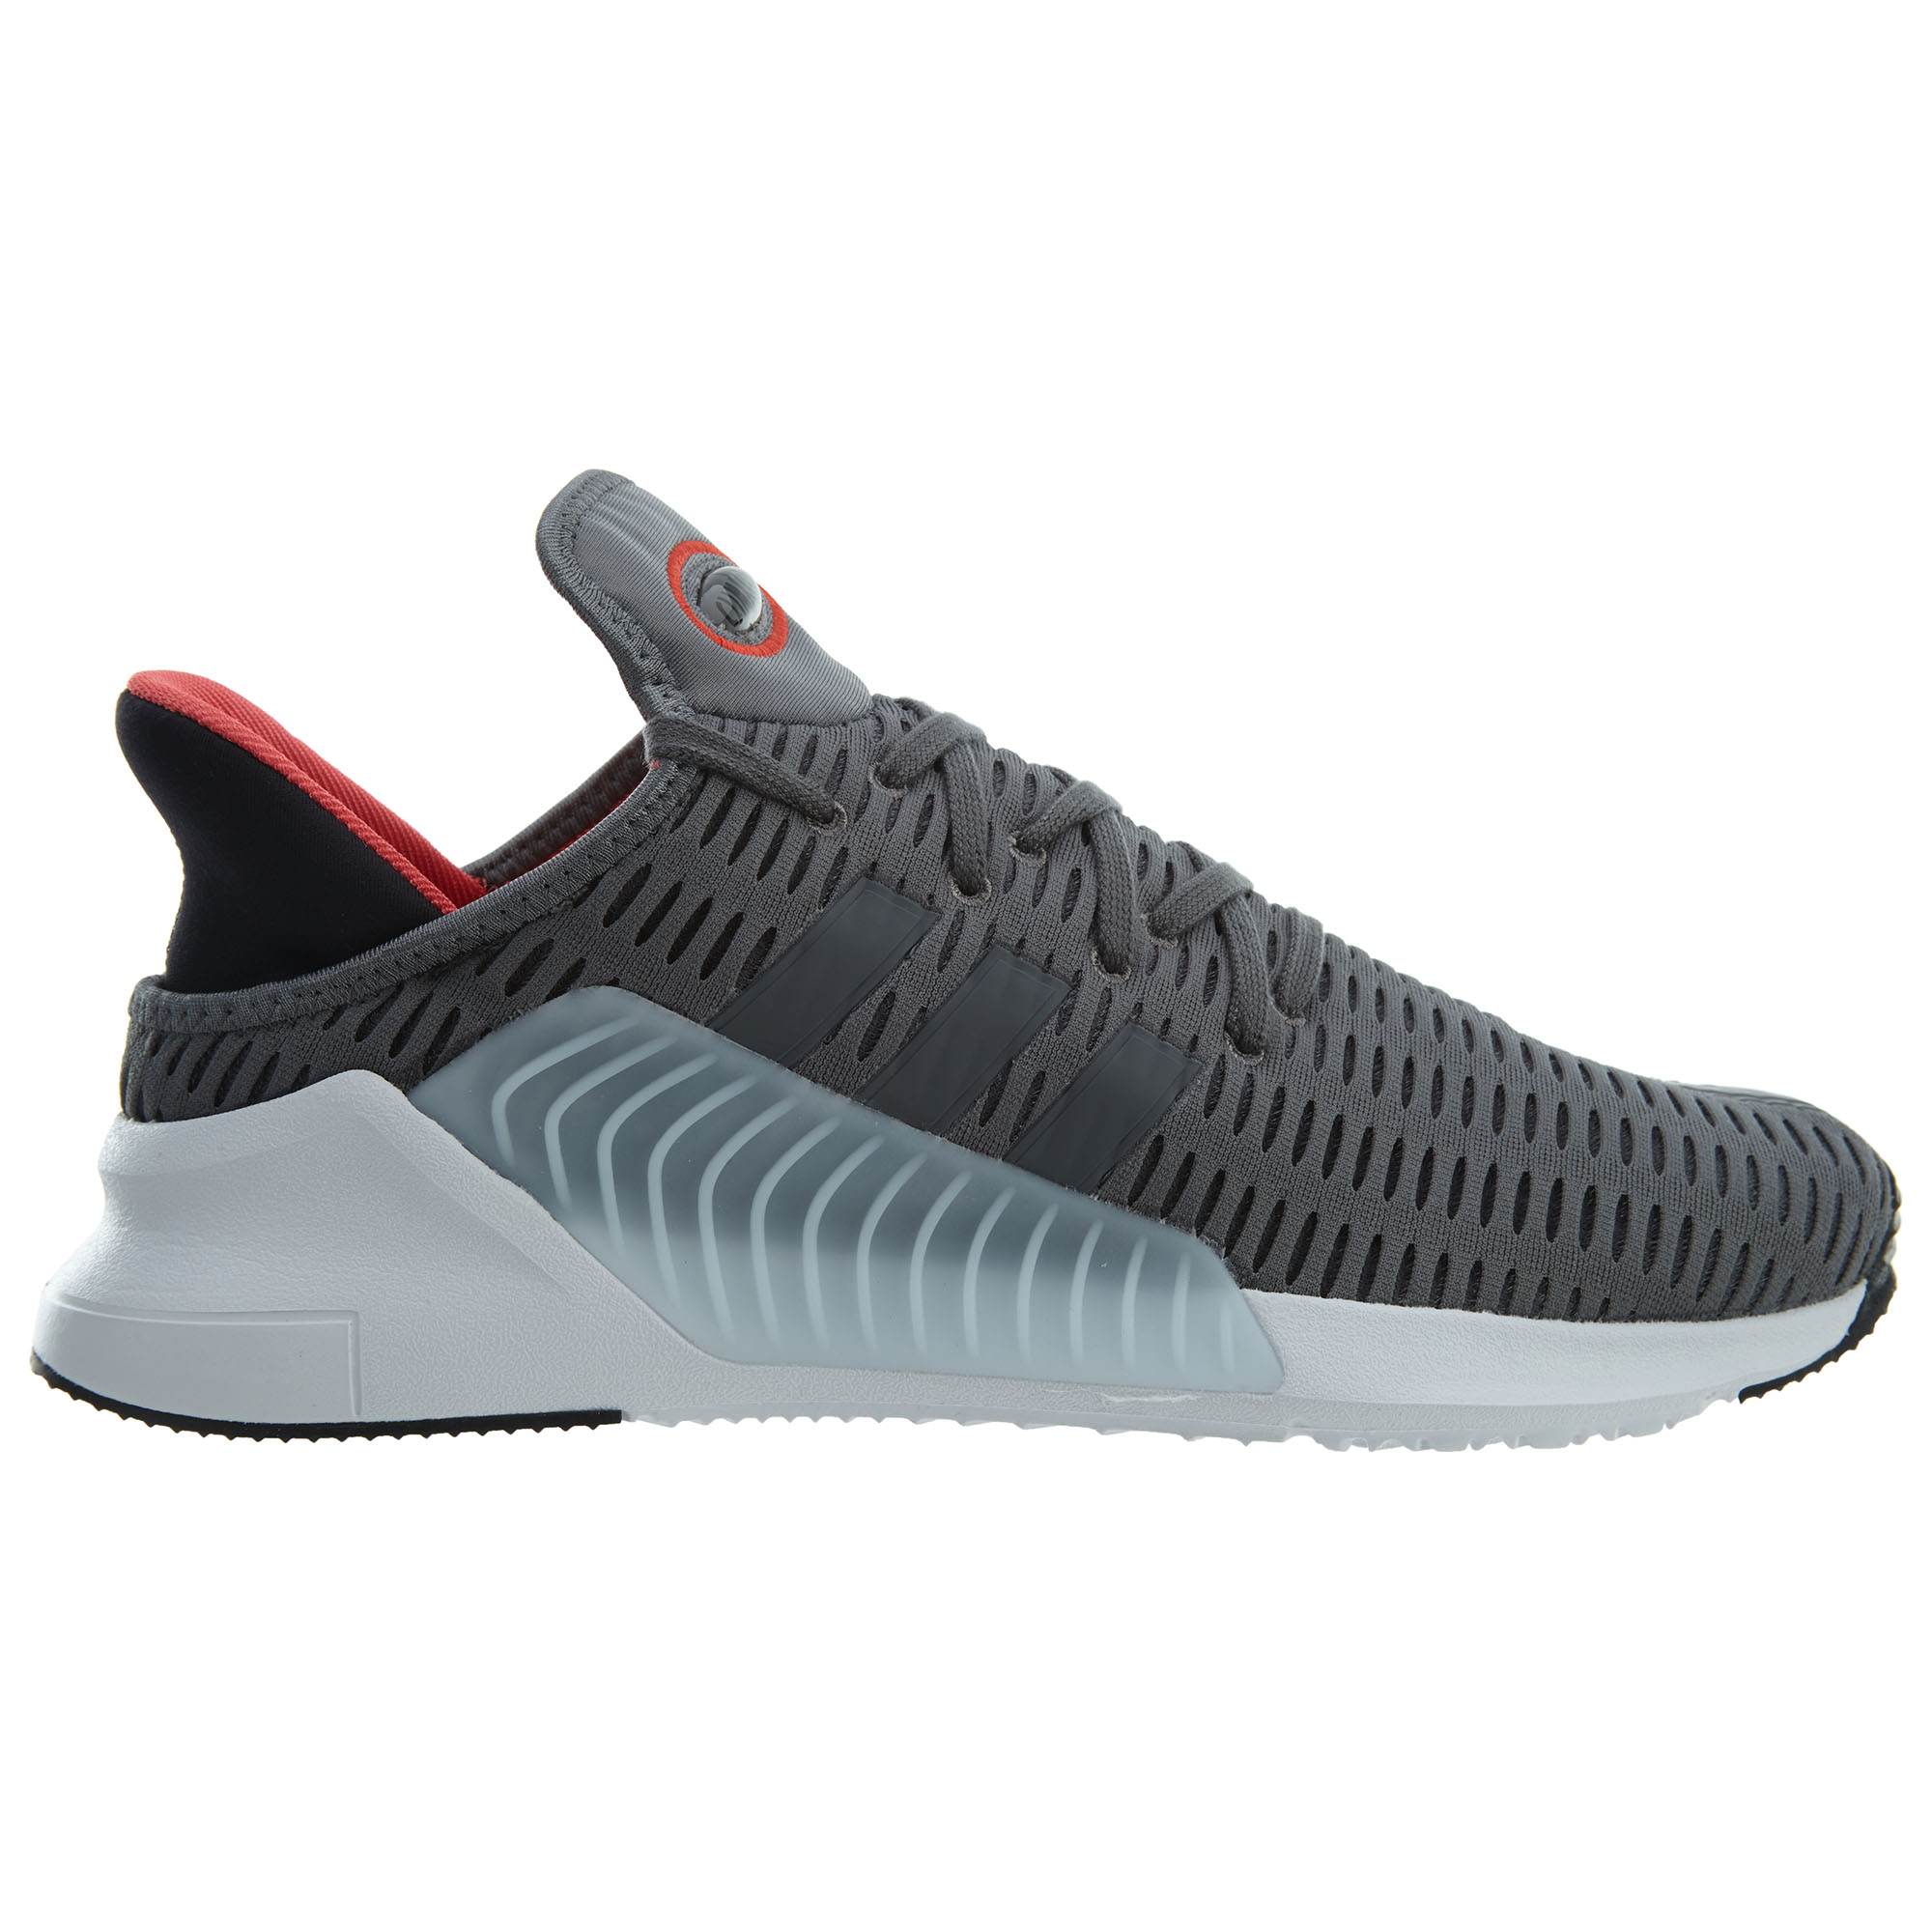 adidas Climacool 02/17 Grey/Grey-White